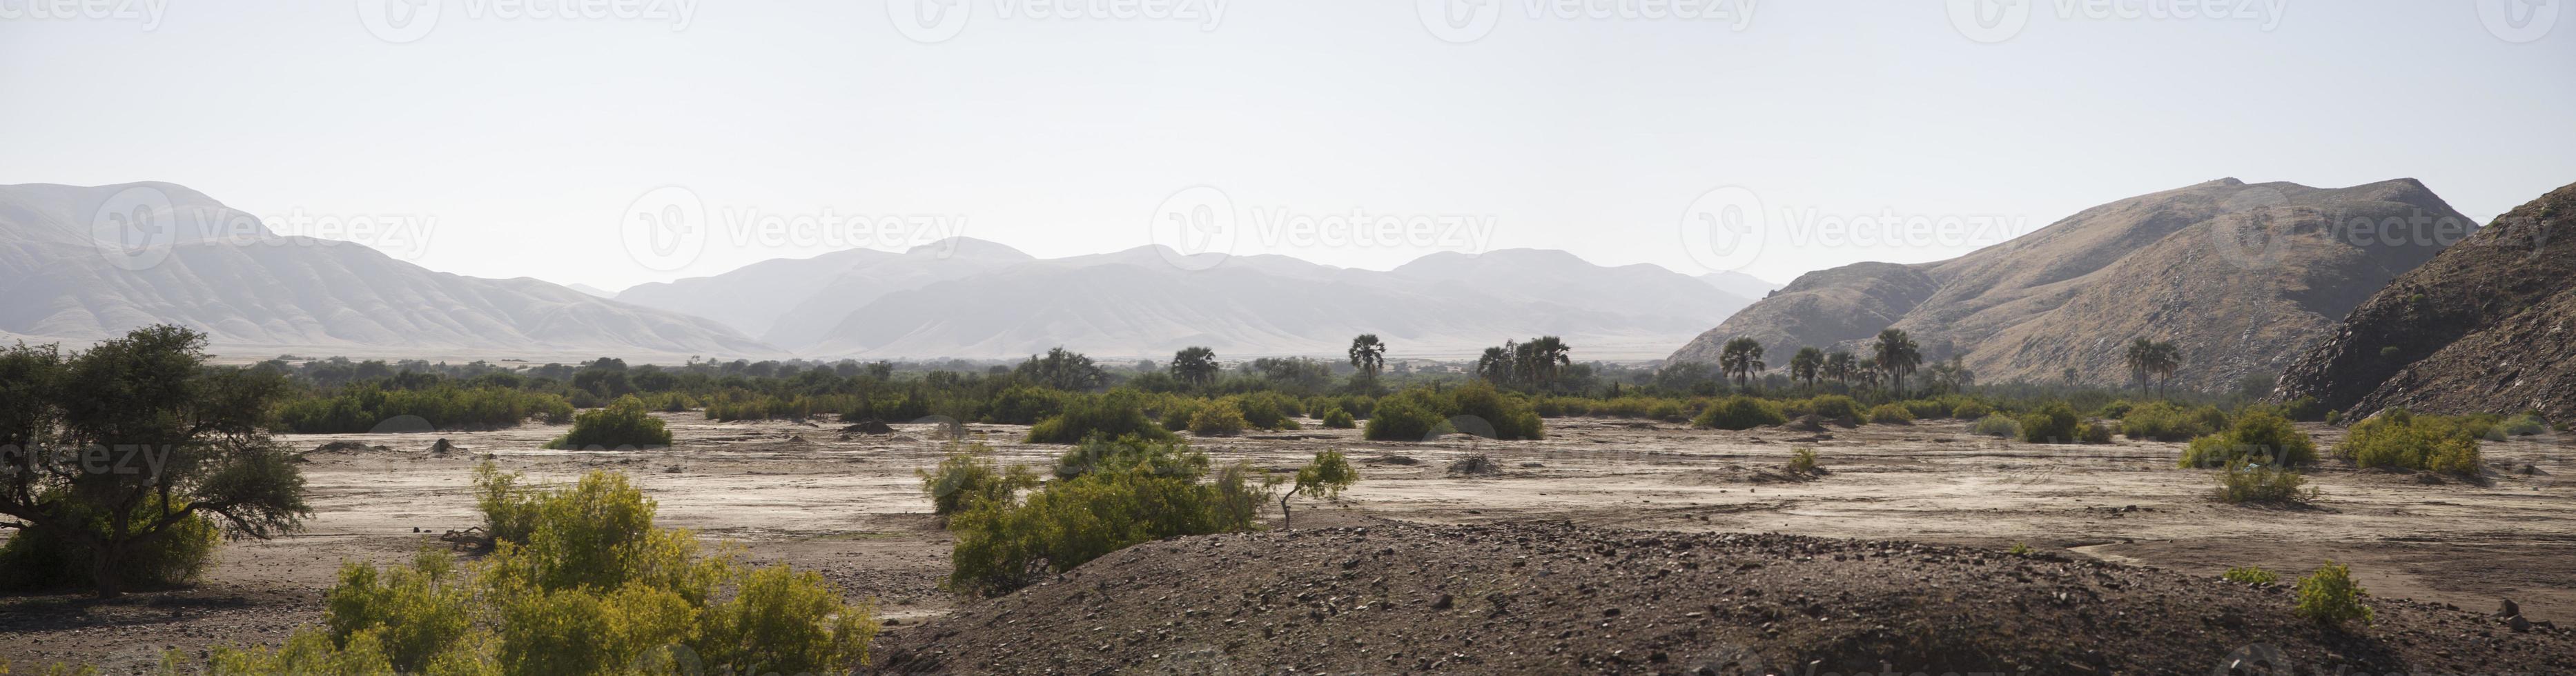 Reserva de caça Kaokoland na Namíbia foto